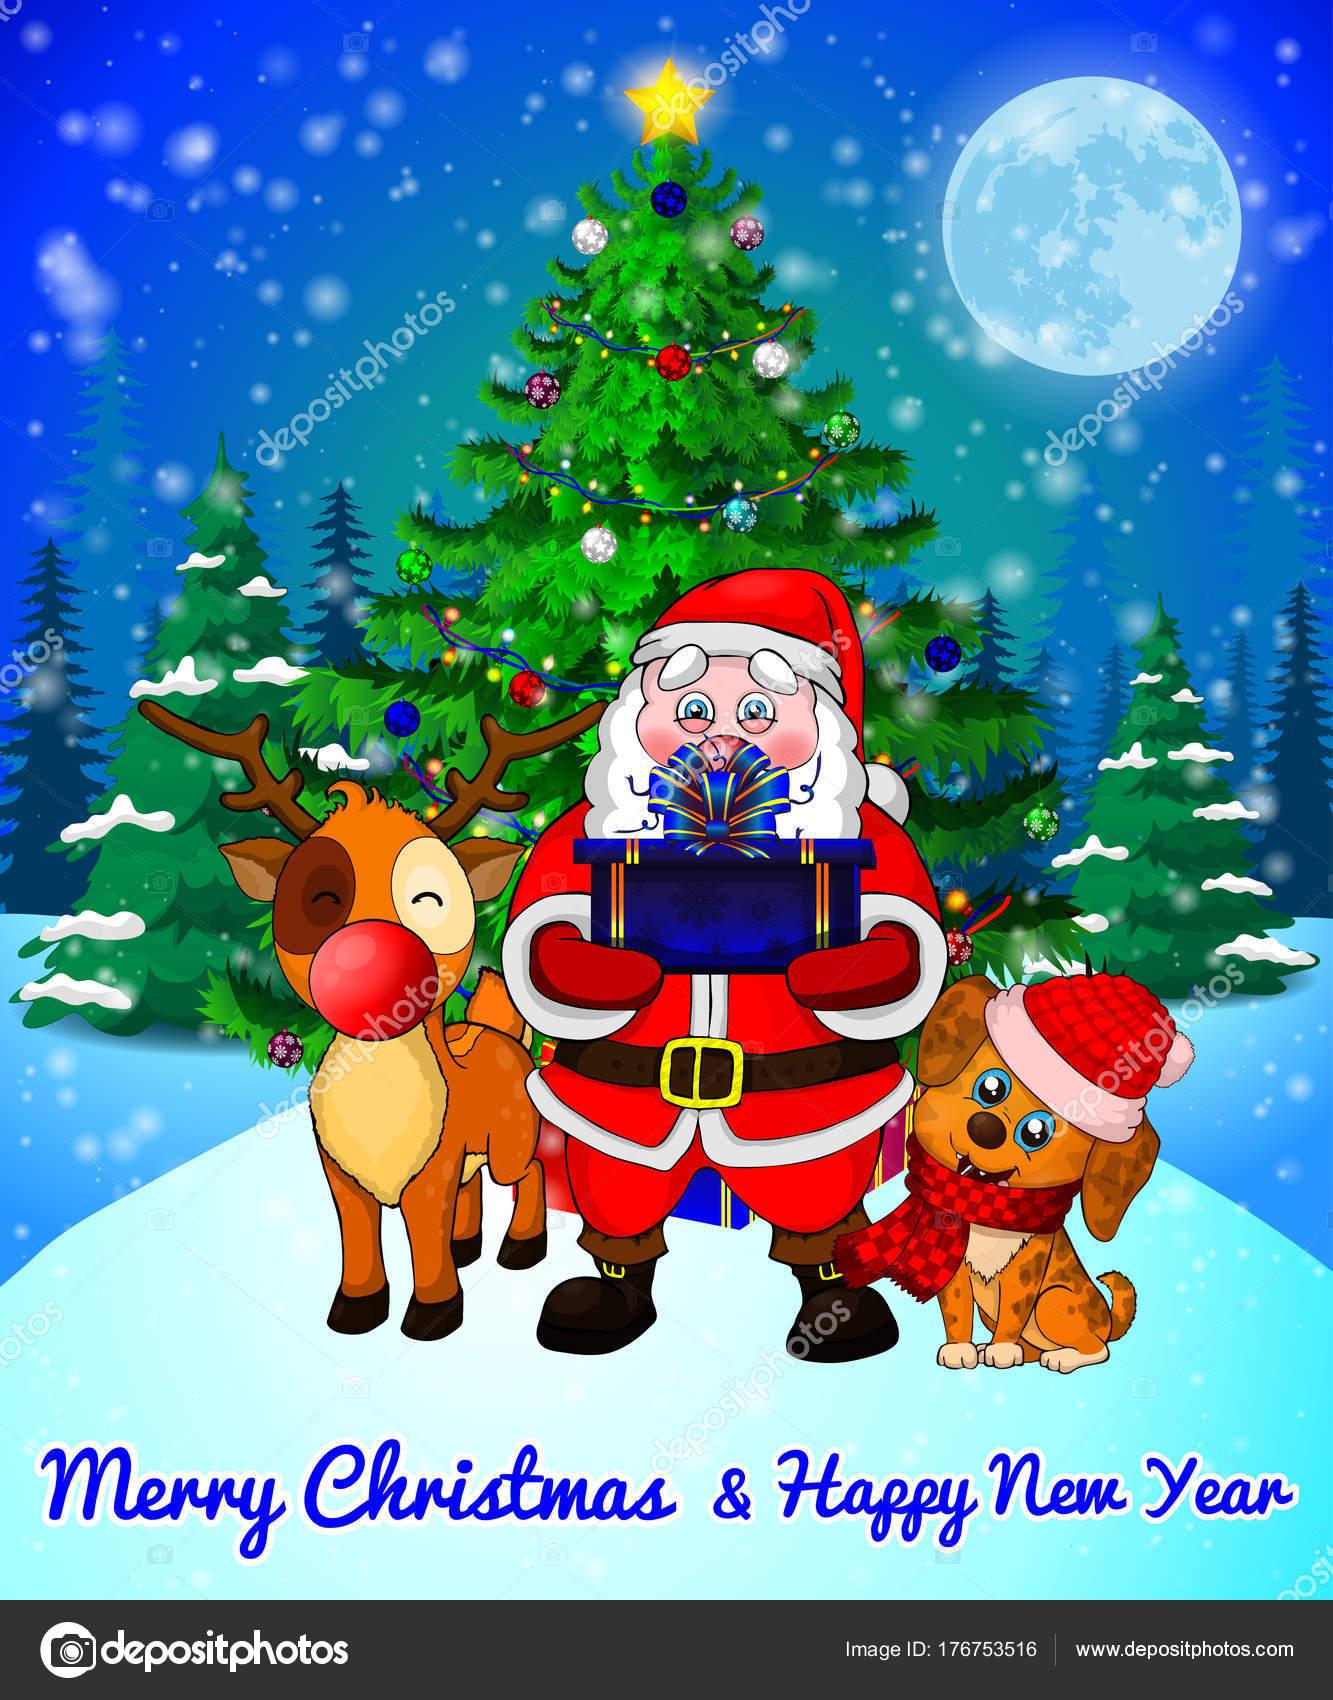 Merry Christmas Greeting Card With Cute Santa Cristmas Dog And Deer